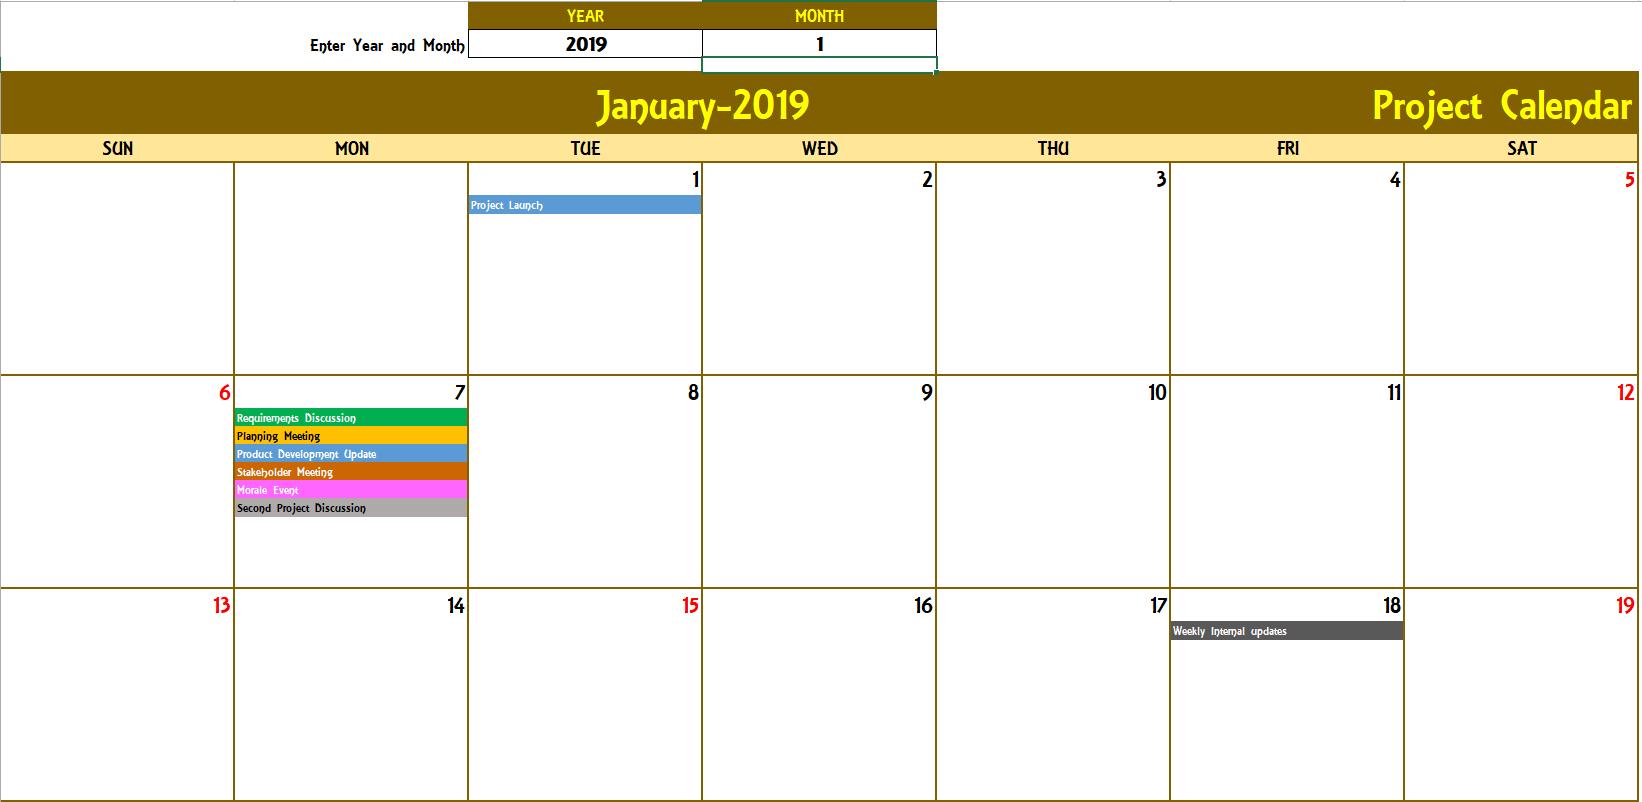 Excel Calendar Template - Excel Calendar 2019, 2020 Or Any Year inside Excel Monthly Calendar Template